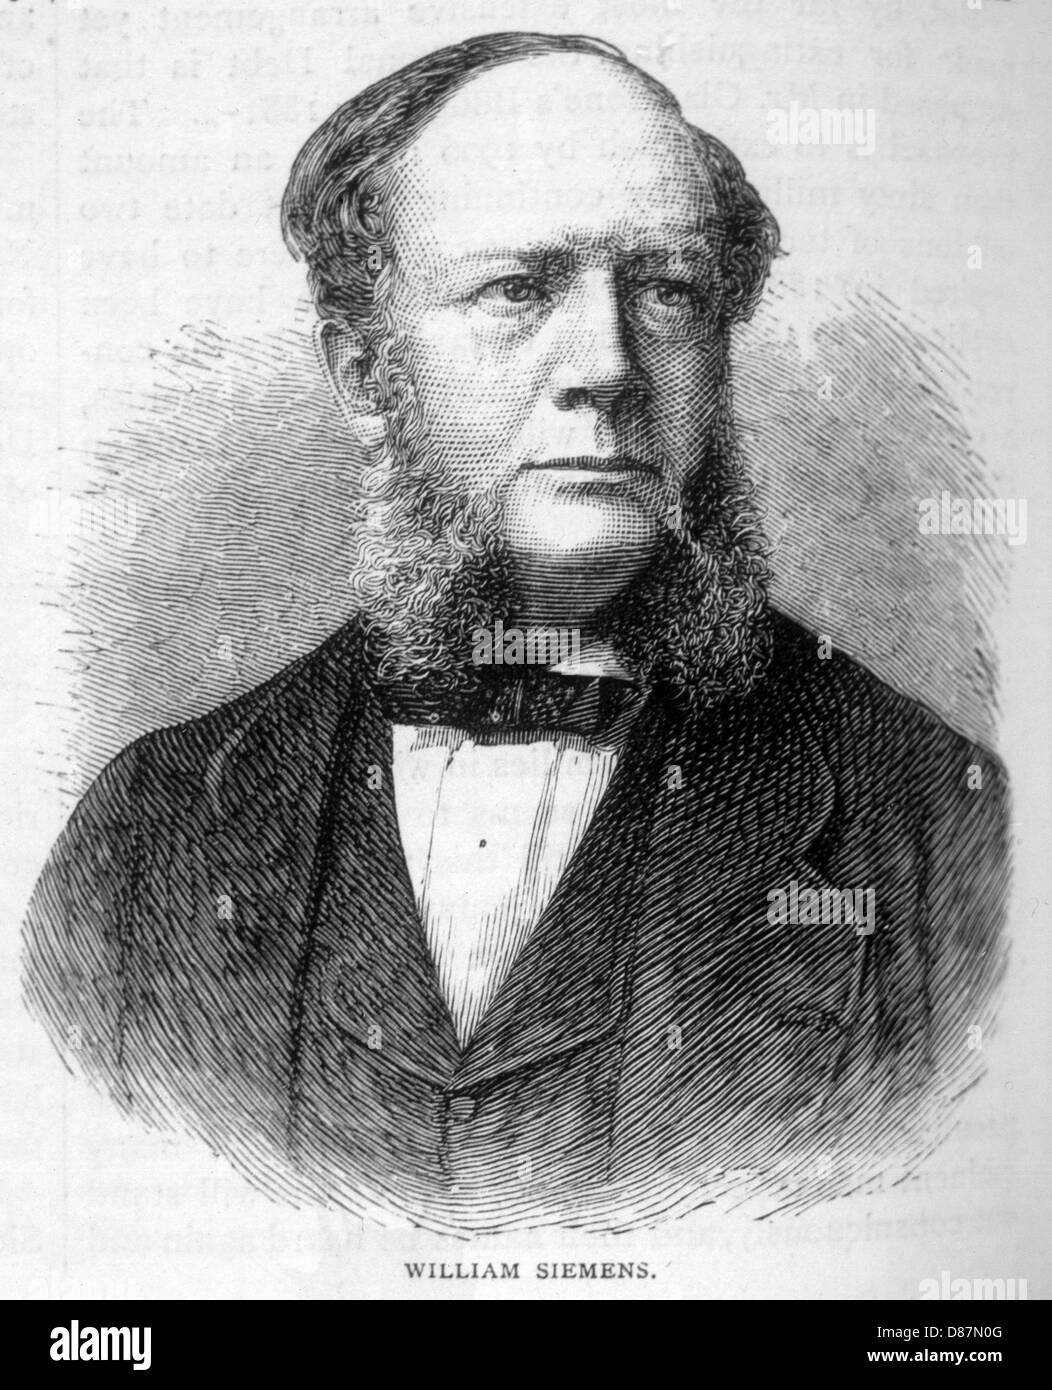 Kw Siemens Cassell 1893 - Stock Image